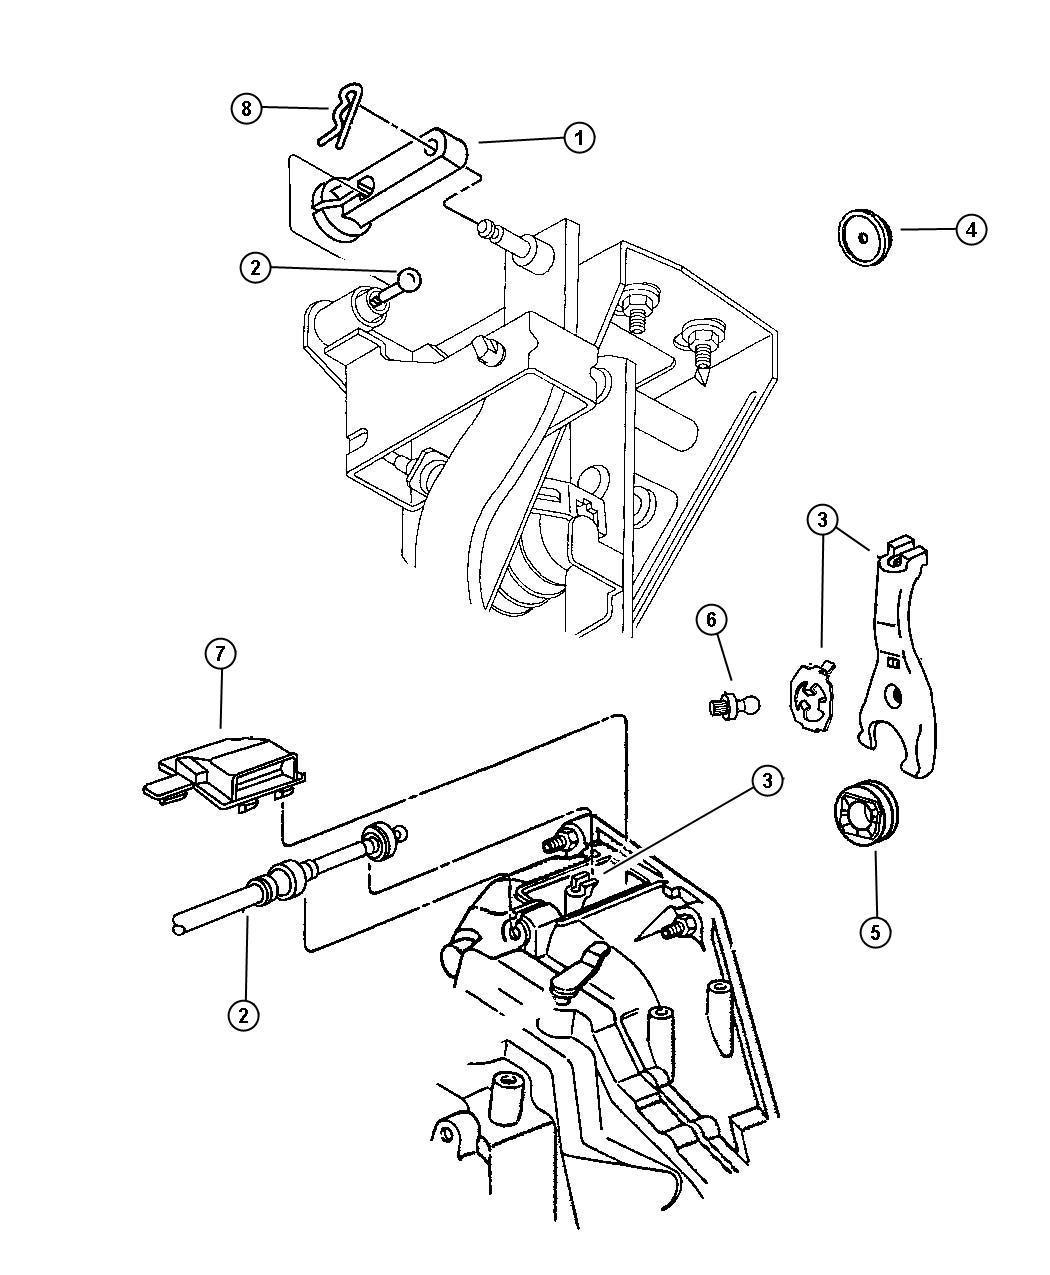 1995 Chrysler Cirrus Cable. Clutch release. Linkage, mopar